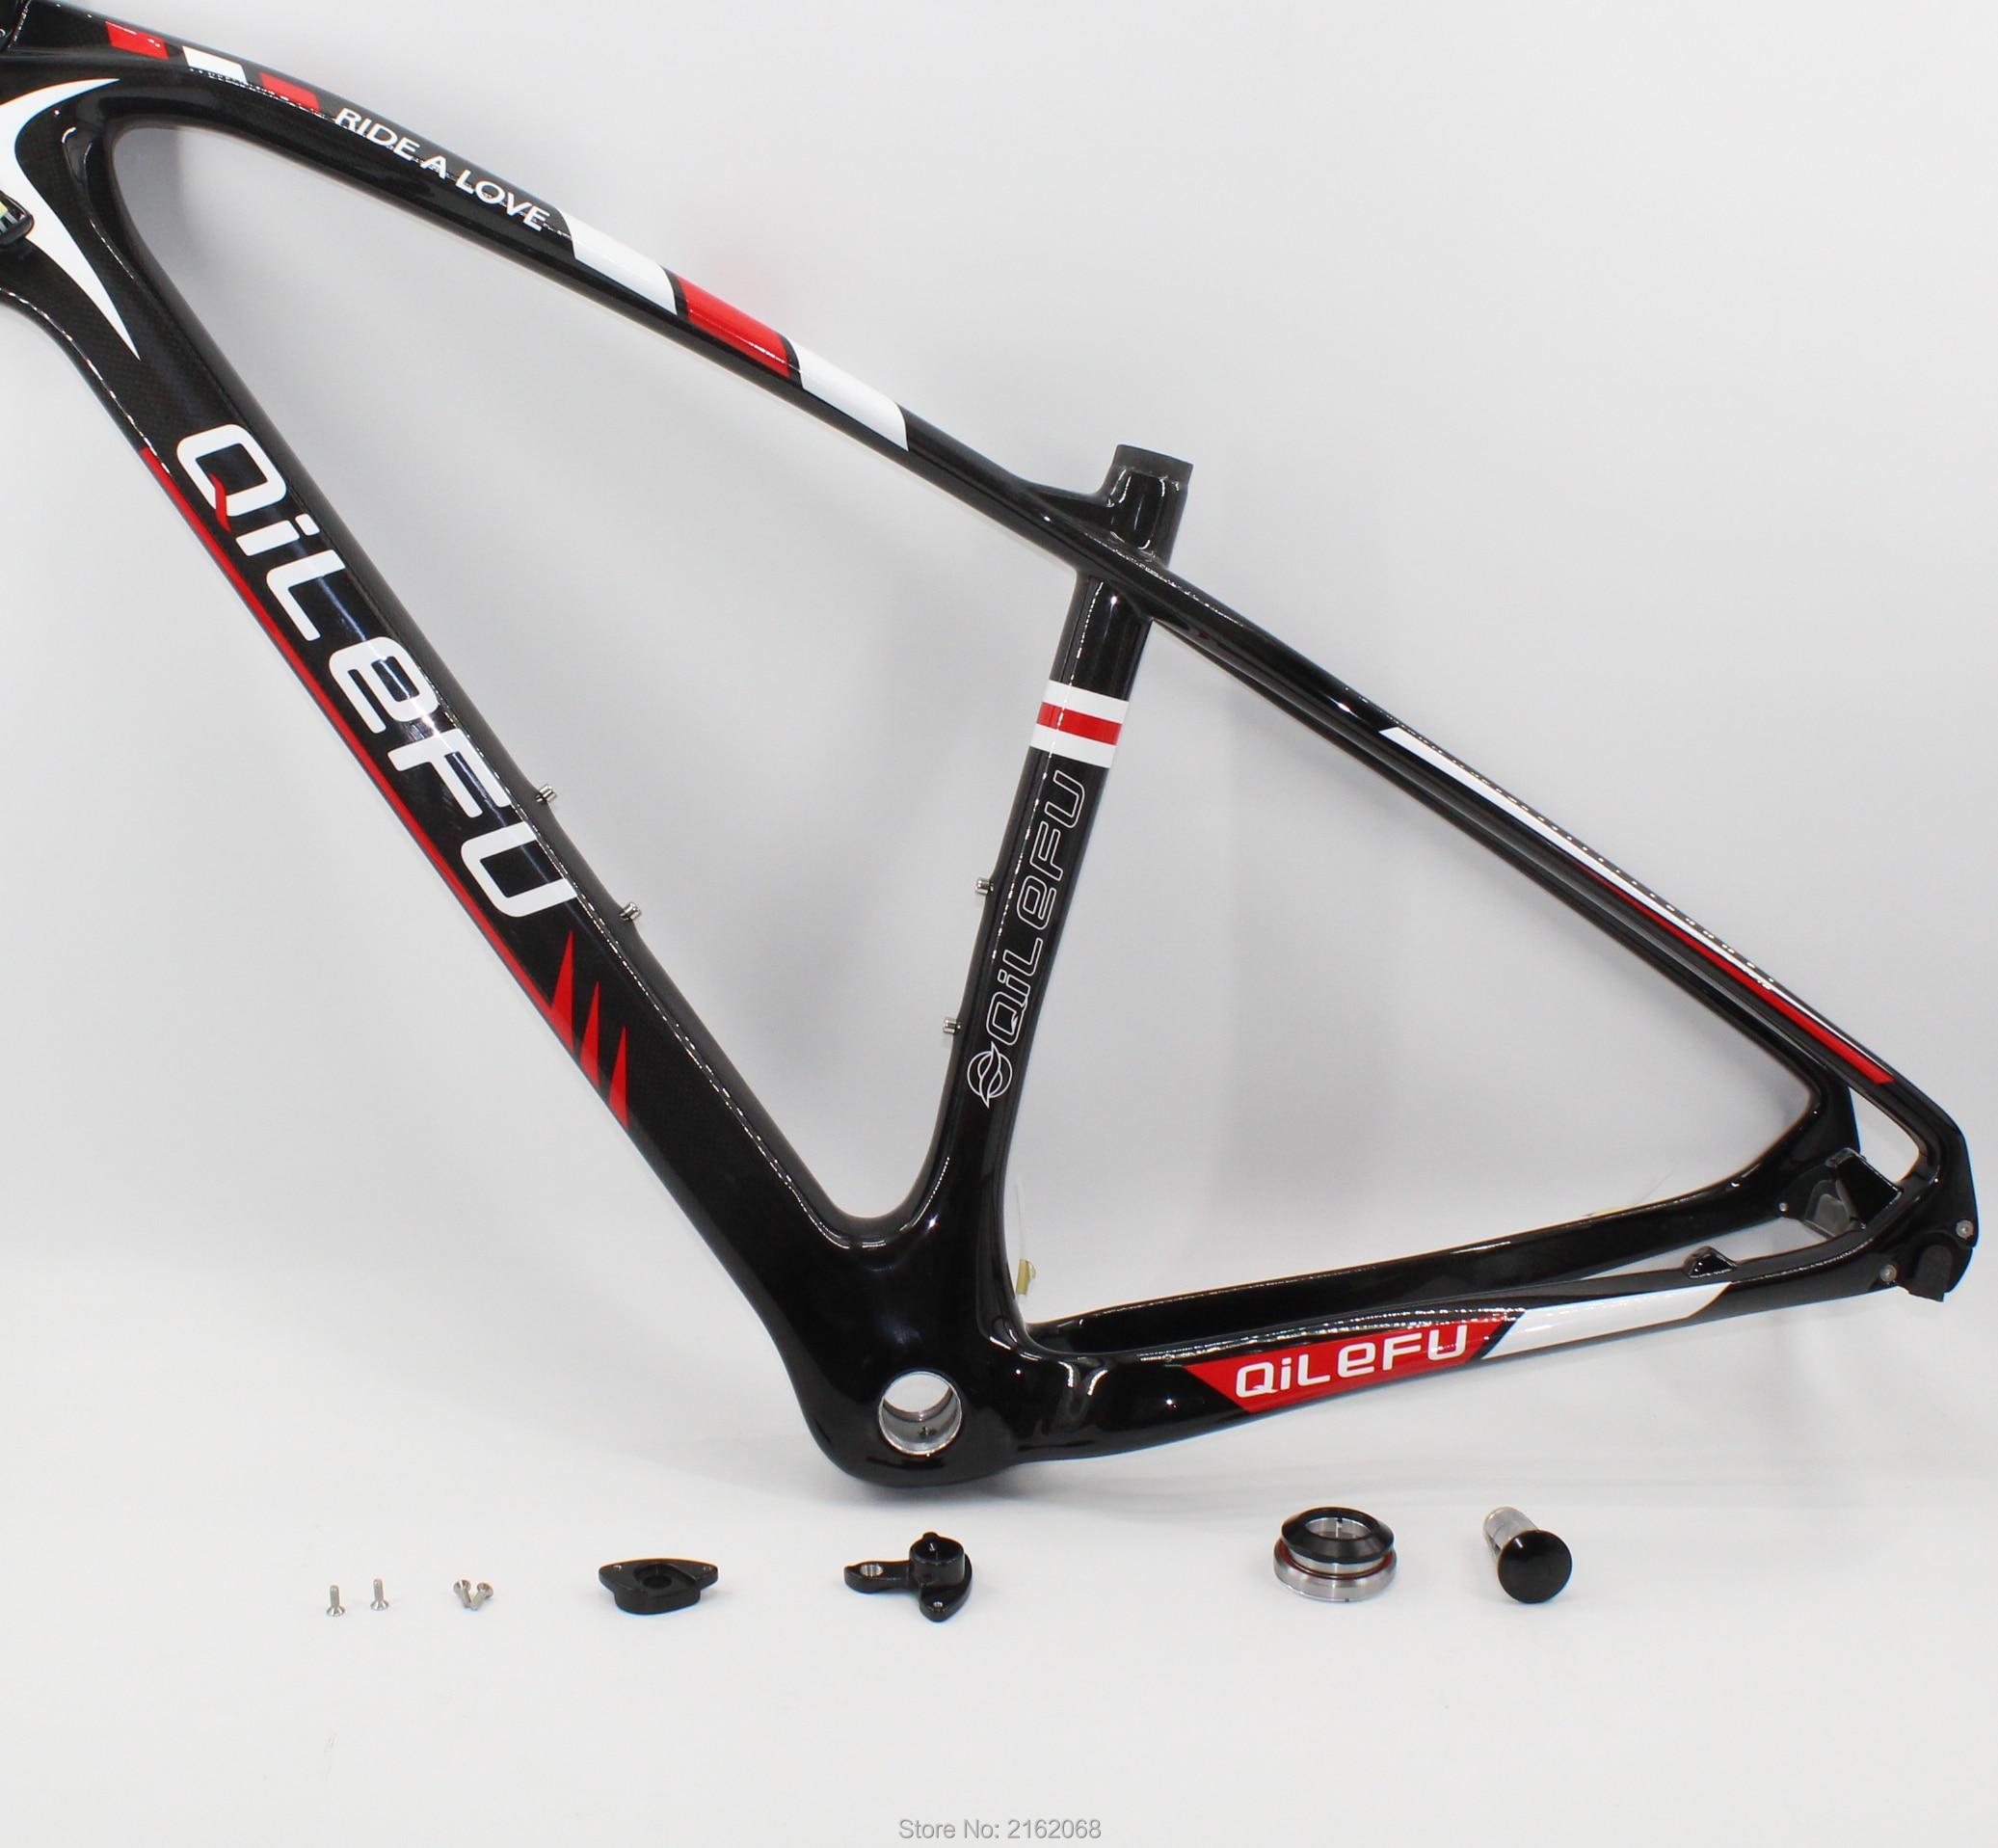 SALE New QILEFU 27.5/29er*15.5/17.5/19 inch Mountain bike 3K UD full carbon fibre bicycle thru axle frame MTB headset Free ship